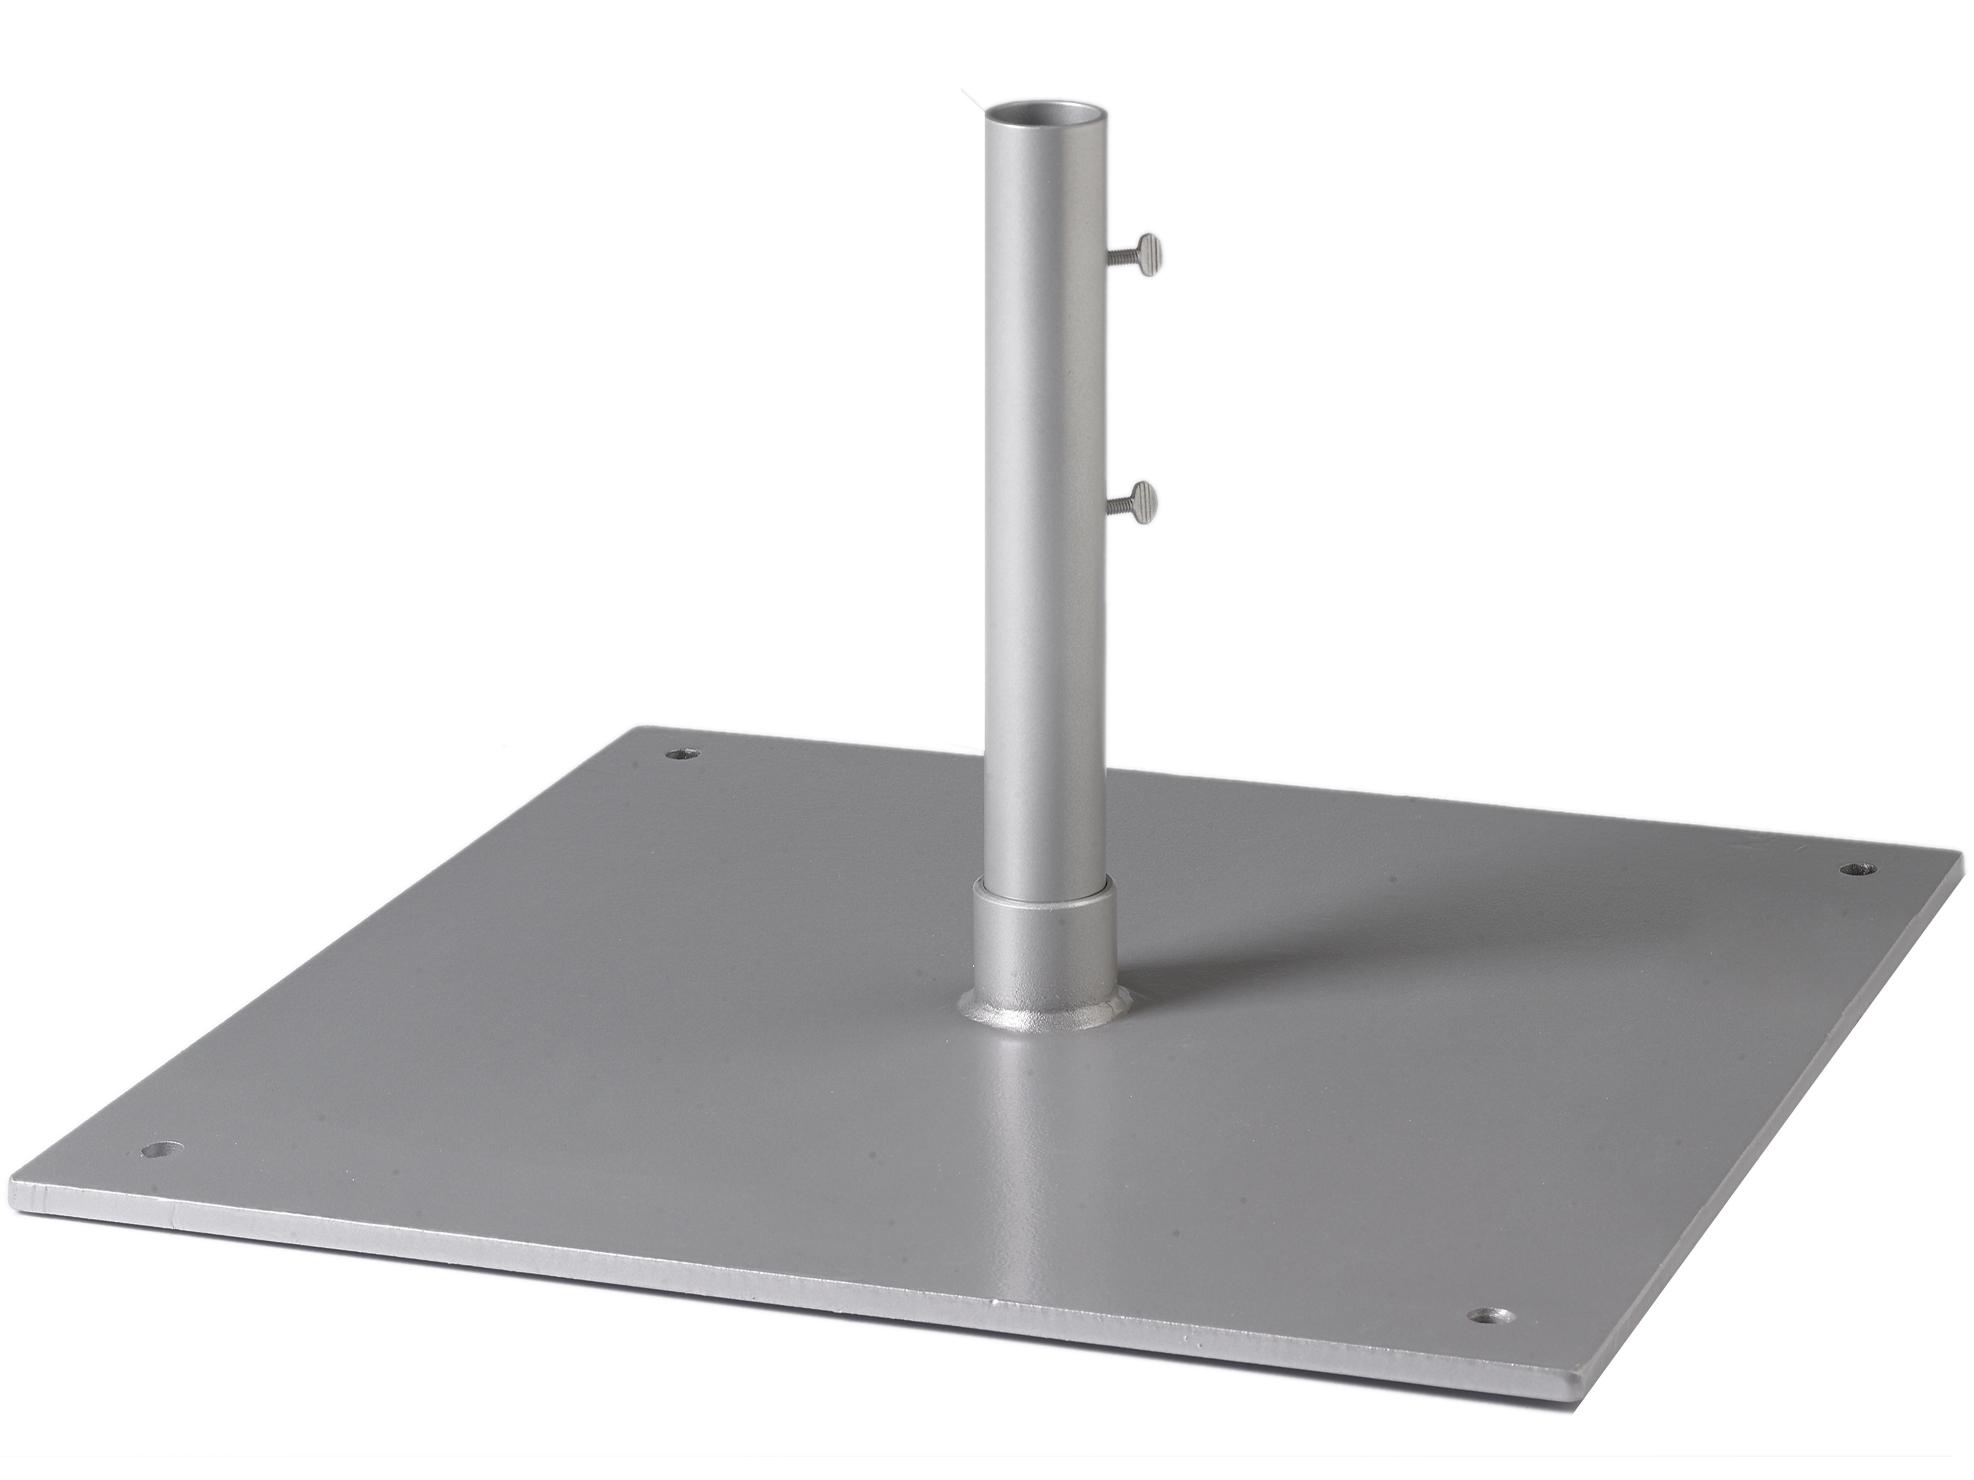 Tropitone 24 82lb Square Steel Plate 15 Sleeve 1 5